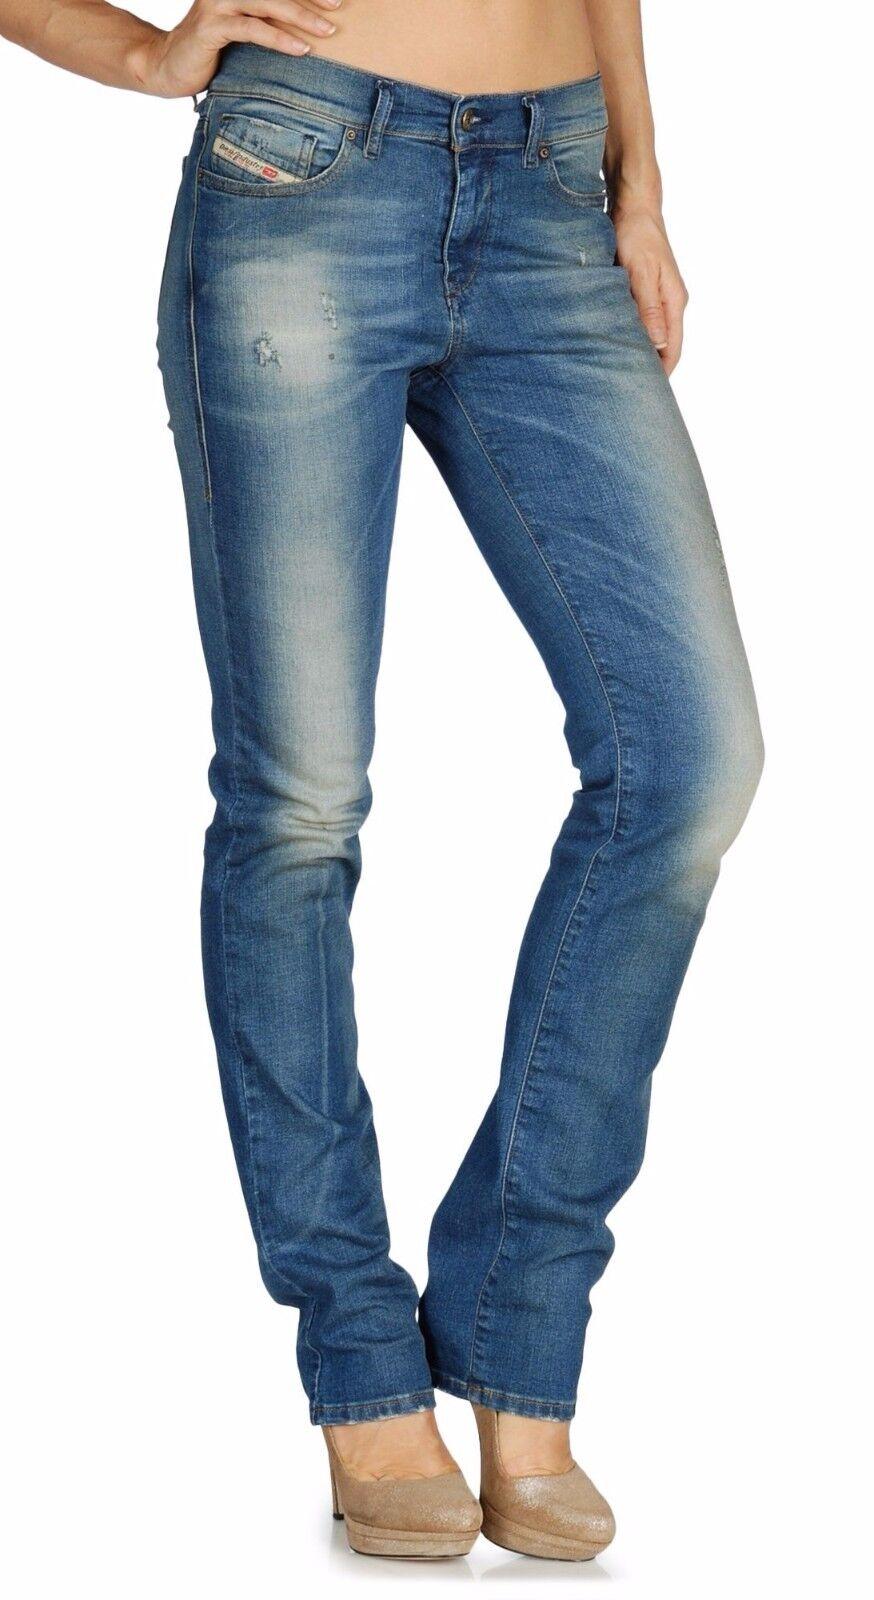 Diesel STRAITZEE Regular Waist Slim Straight Fit Jeans 0806I Medium 25x32  268